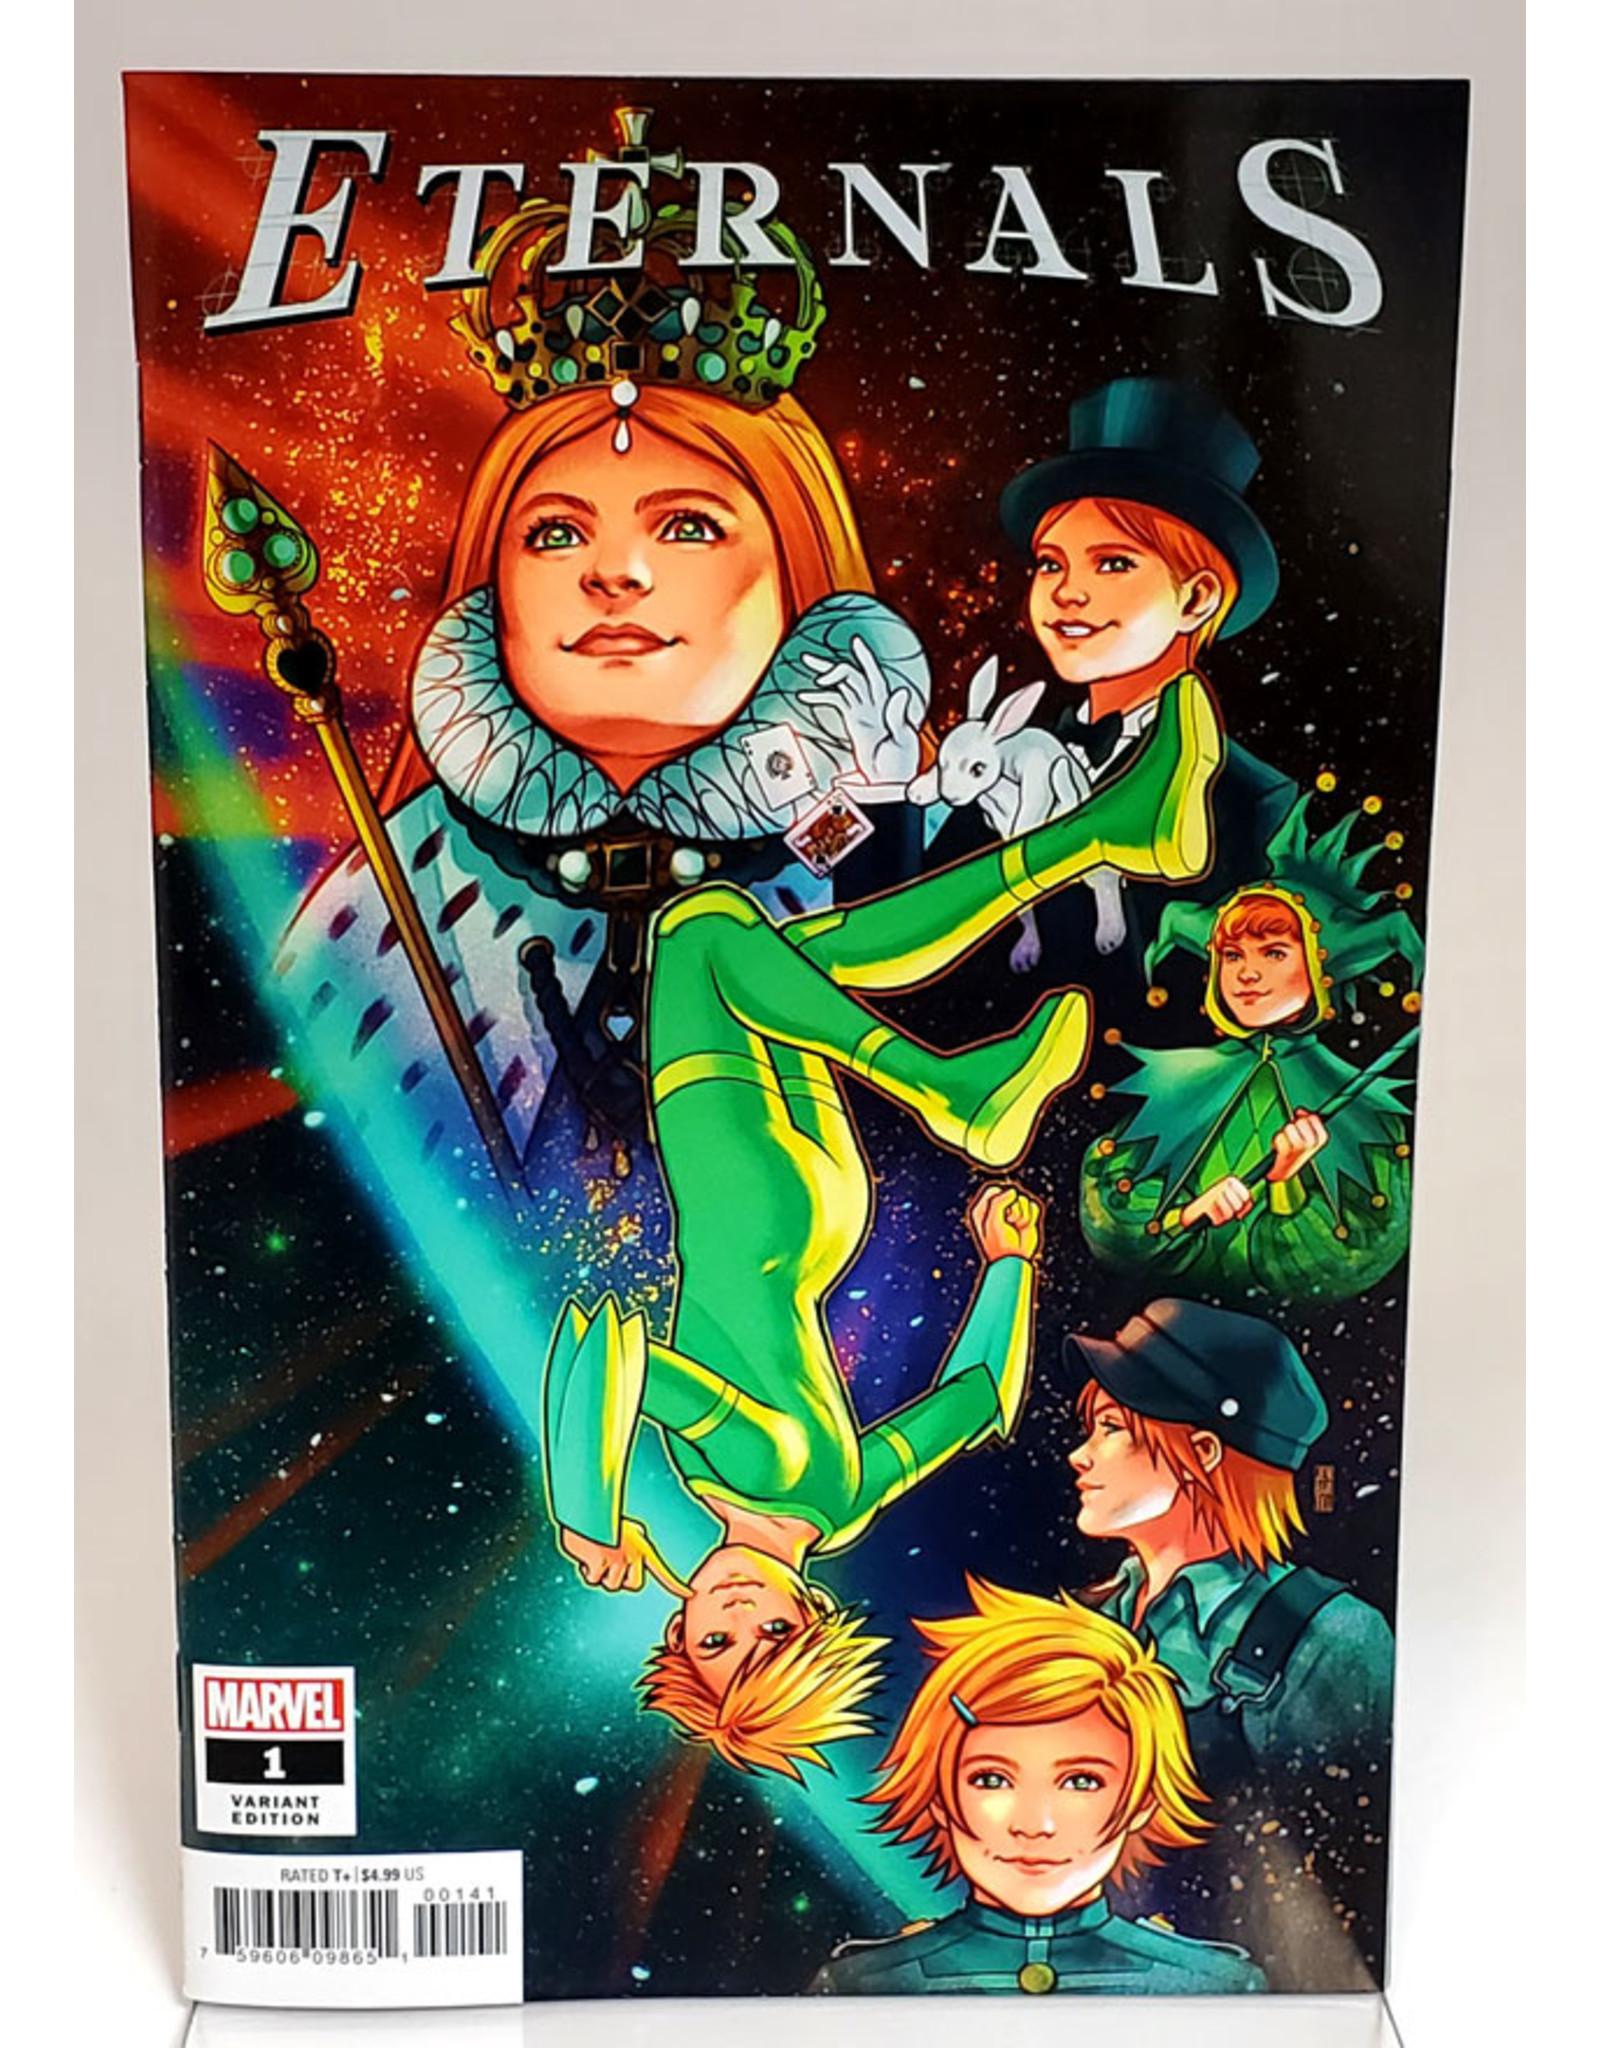 MARVEL COMICS ETERNALS #1 1:25 BARTEL VAR